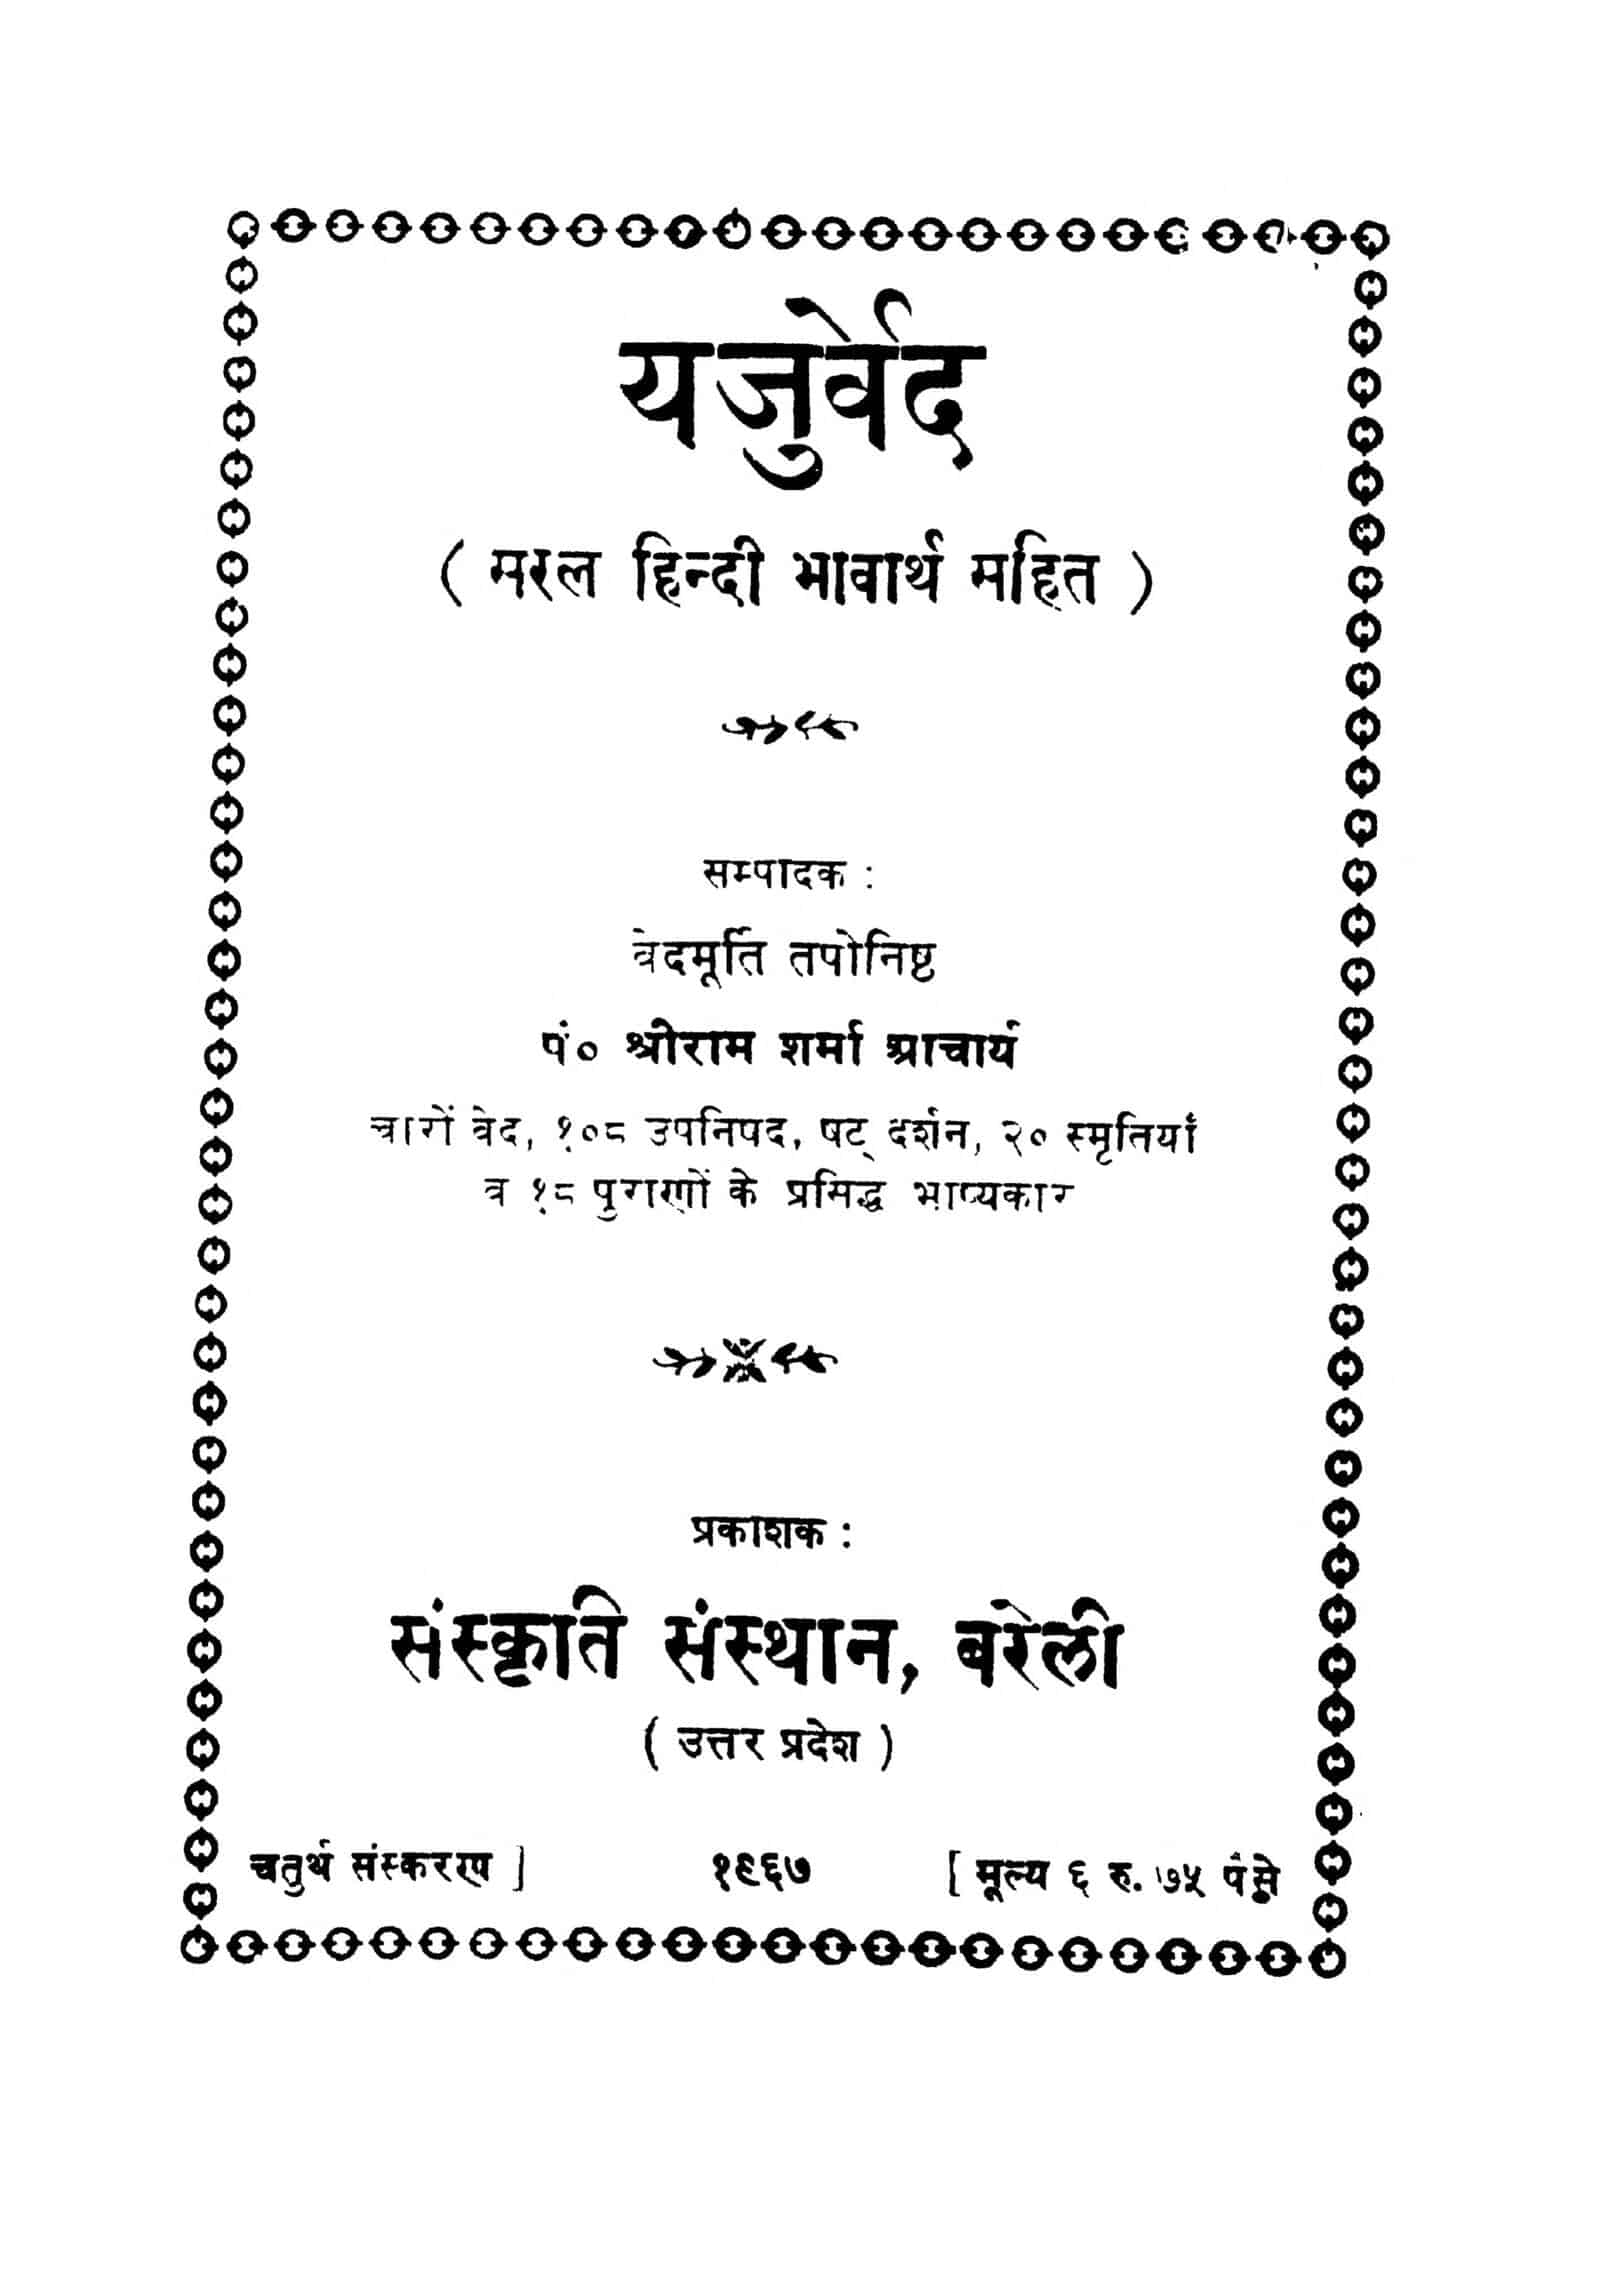 Yajurved by वेदमूर्ति तपोनिष्ठ - Vedmurti Taponishth